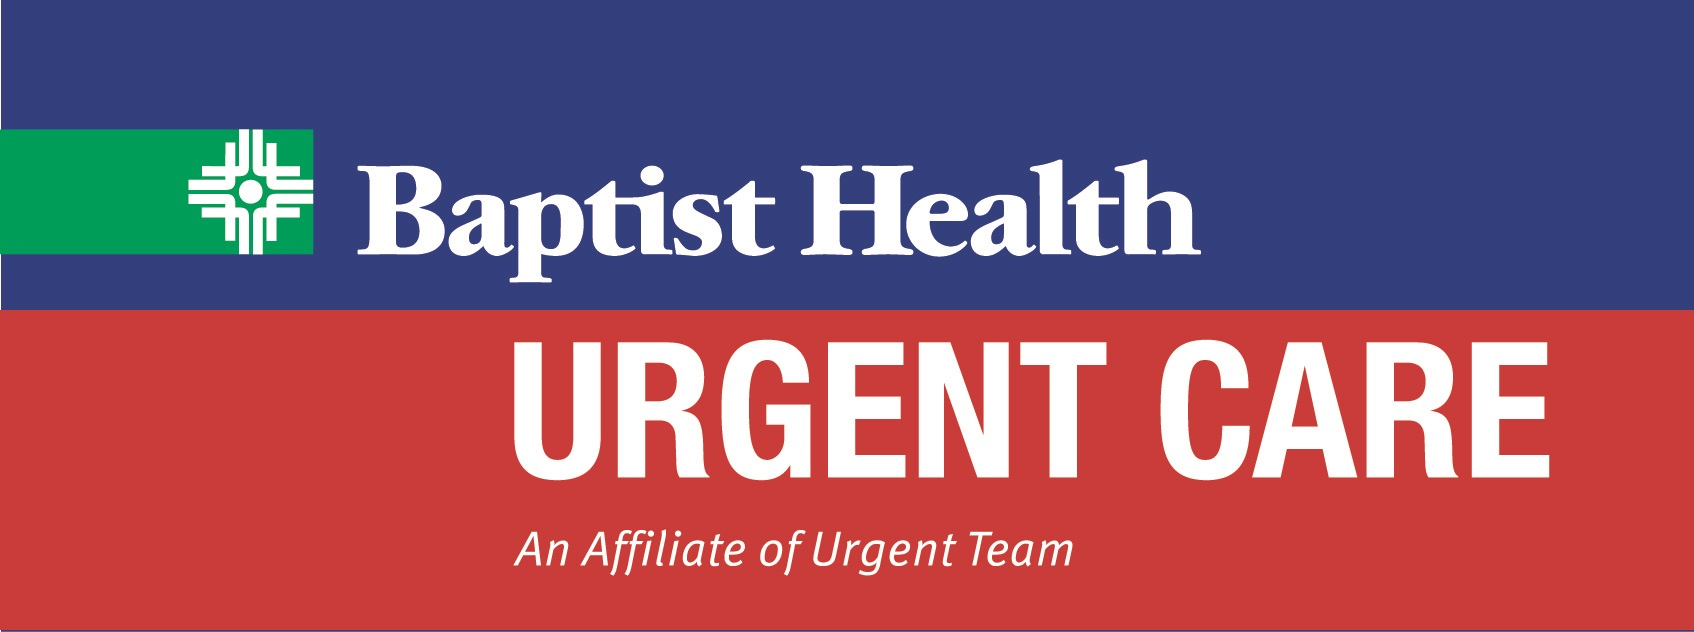 Baptist Health Urgent Care - Cabot Logo